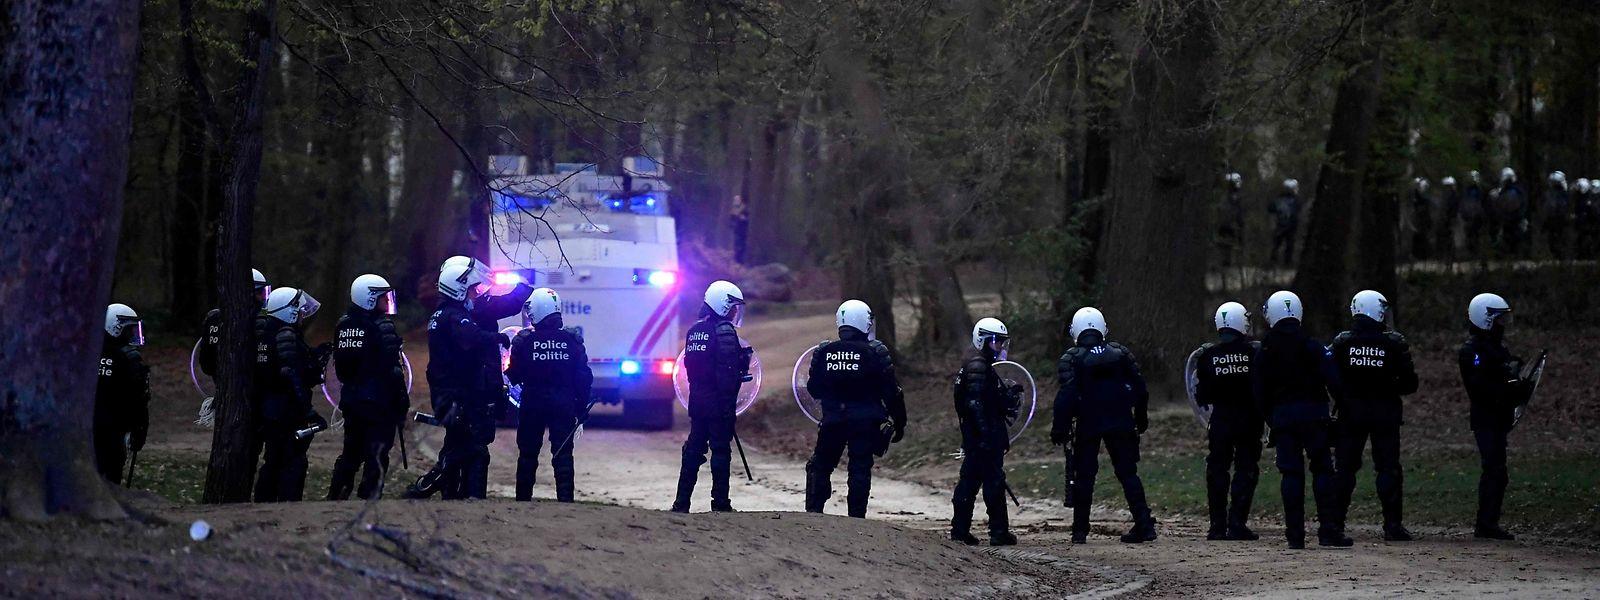 Auch am Donnerstag eskalierte die Gewalt im Bois de la Cambre.